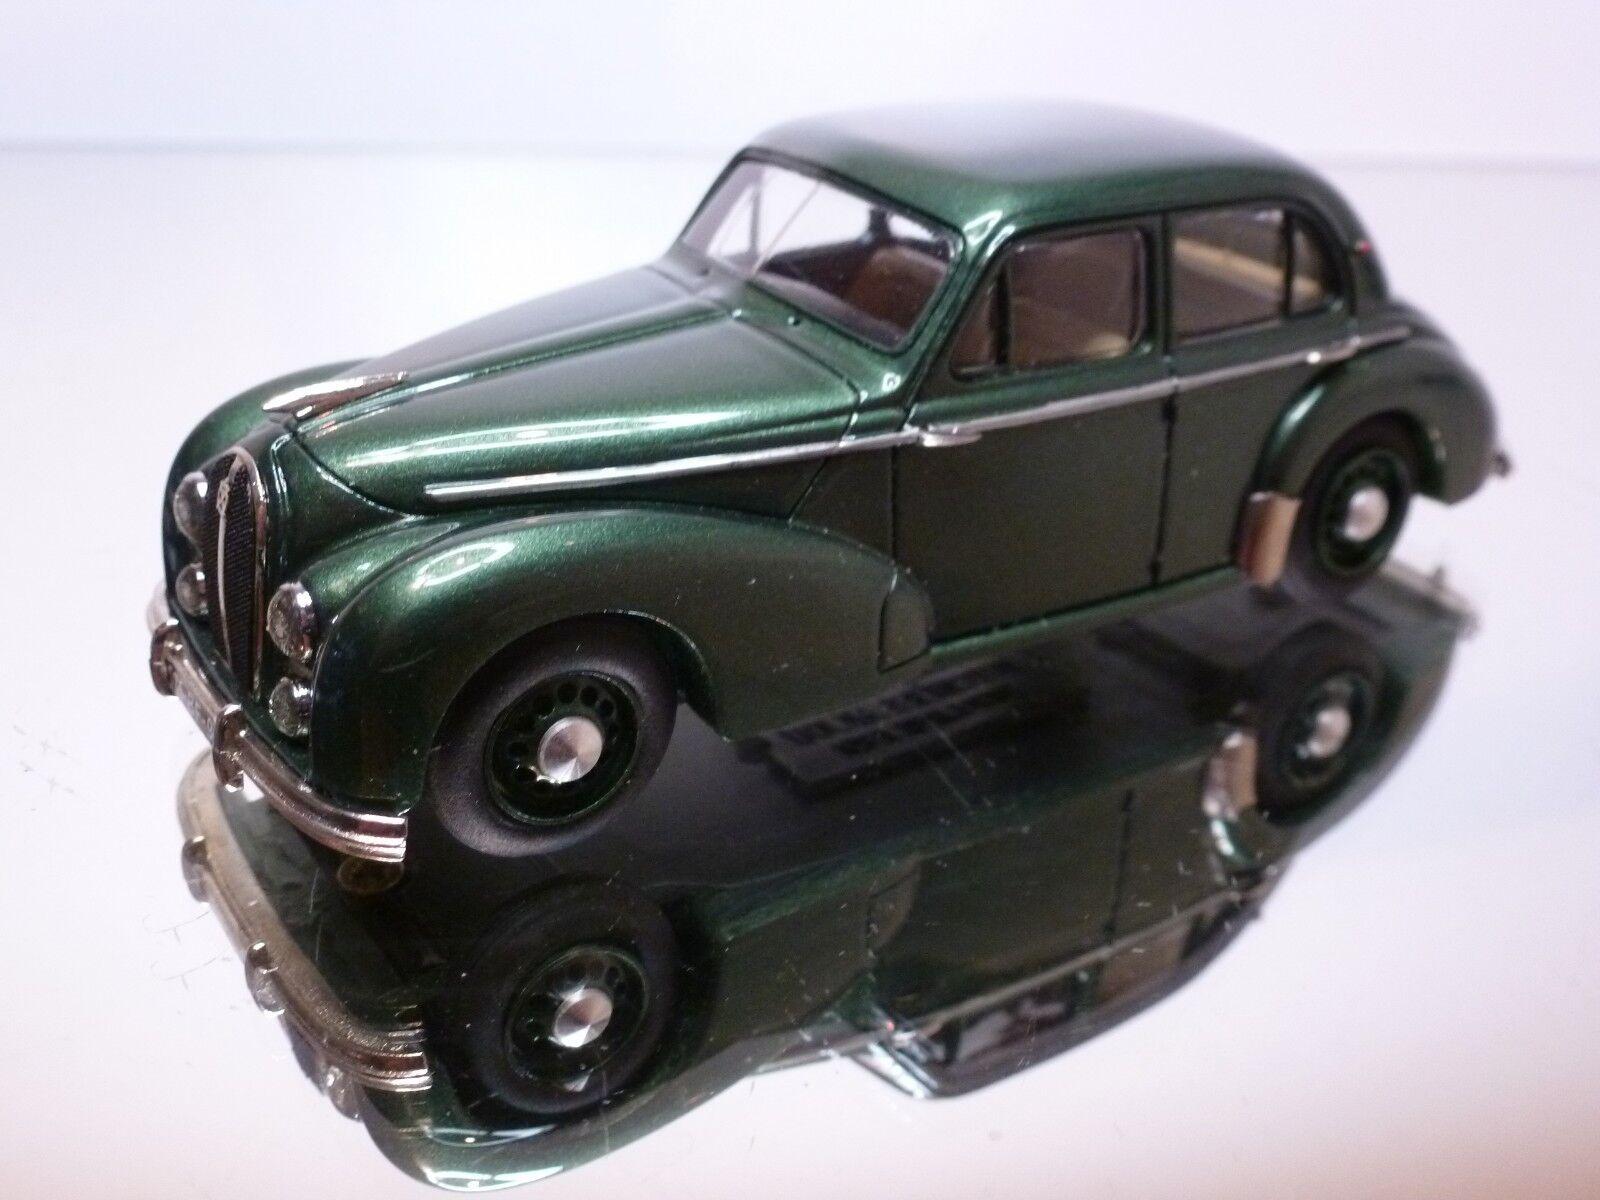 CLASSIQUES HOTCHKISS ANJOU BERLINE 1951 - verde METALLIC 1 43 - EXCELLENT -24+25